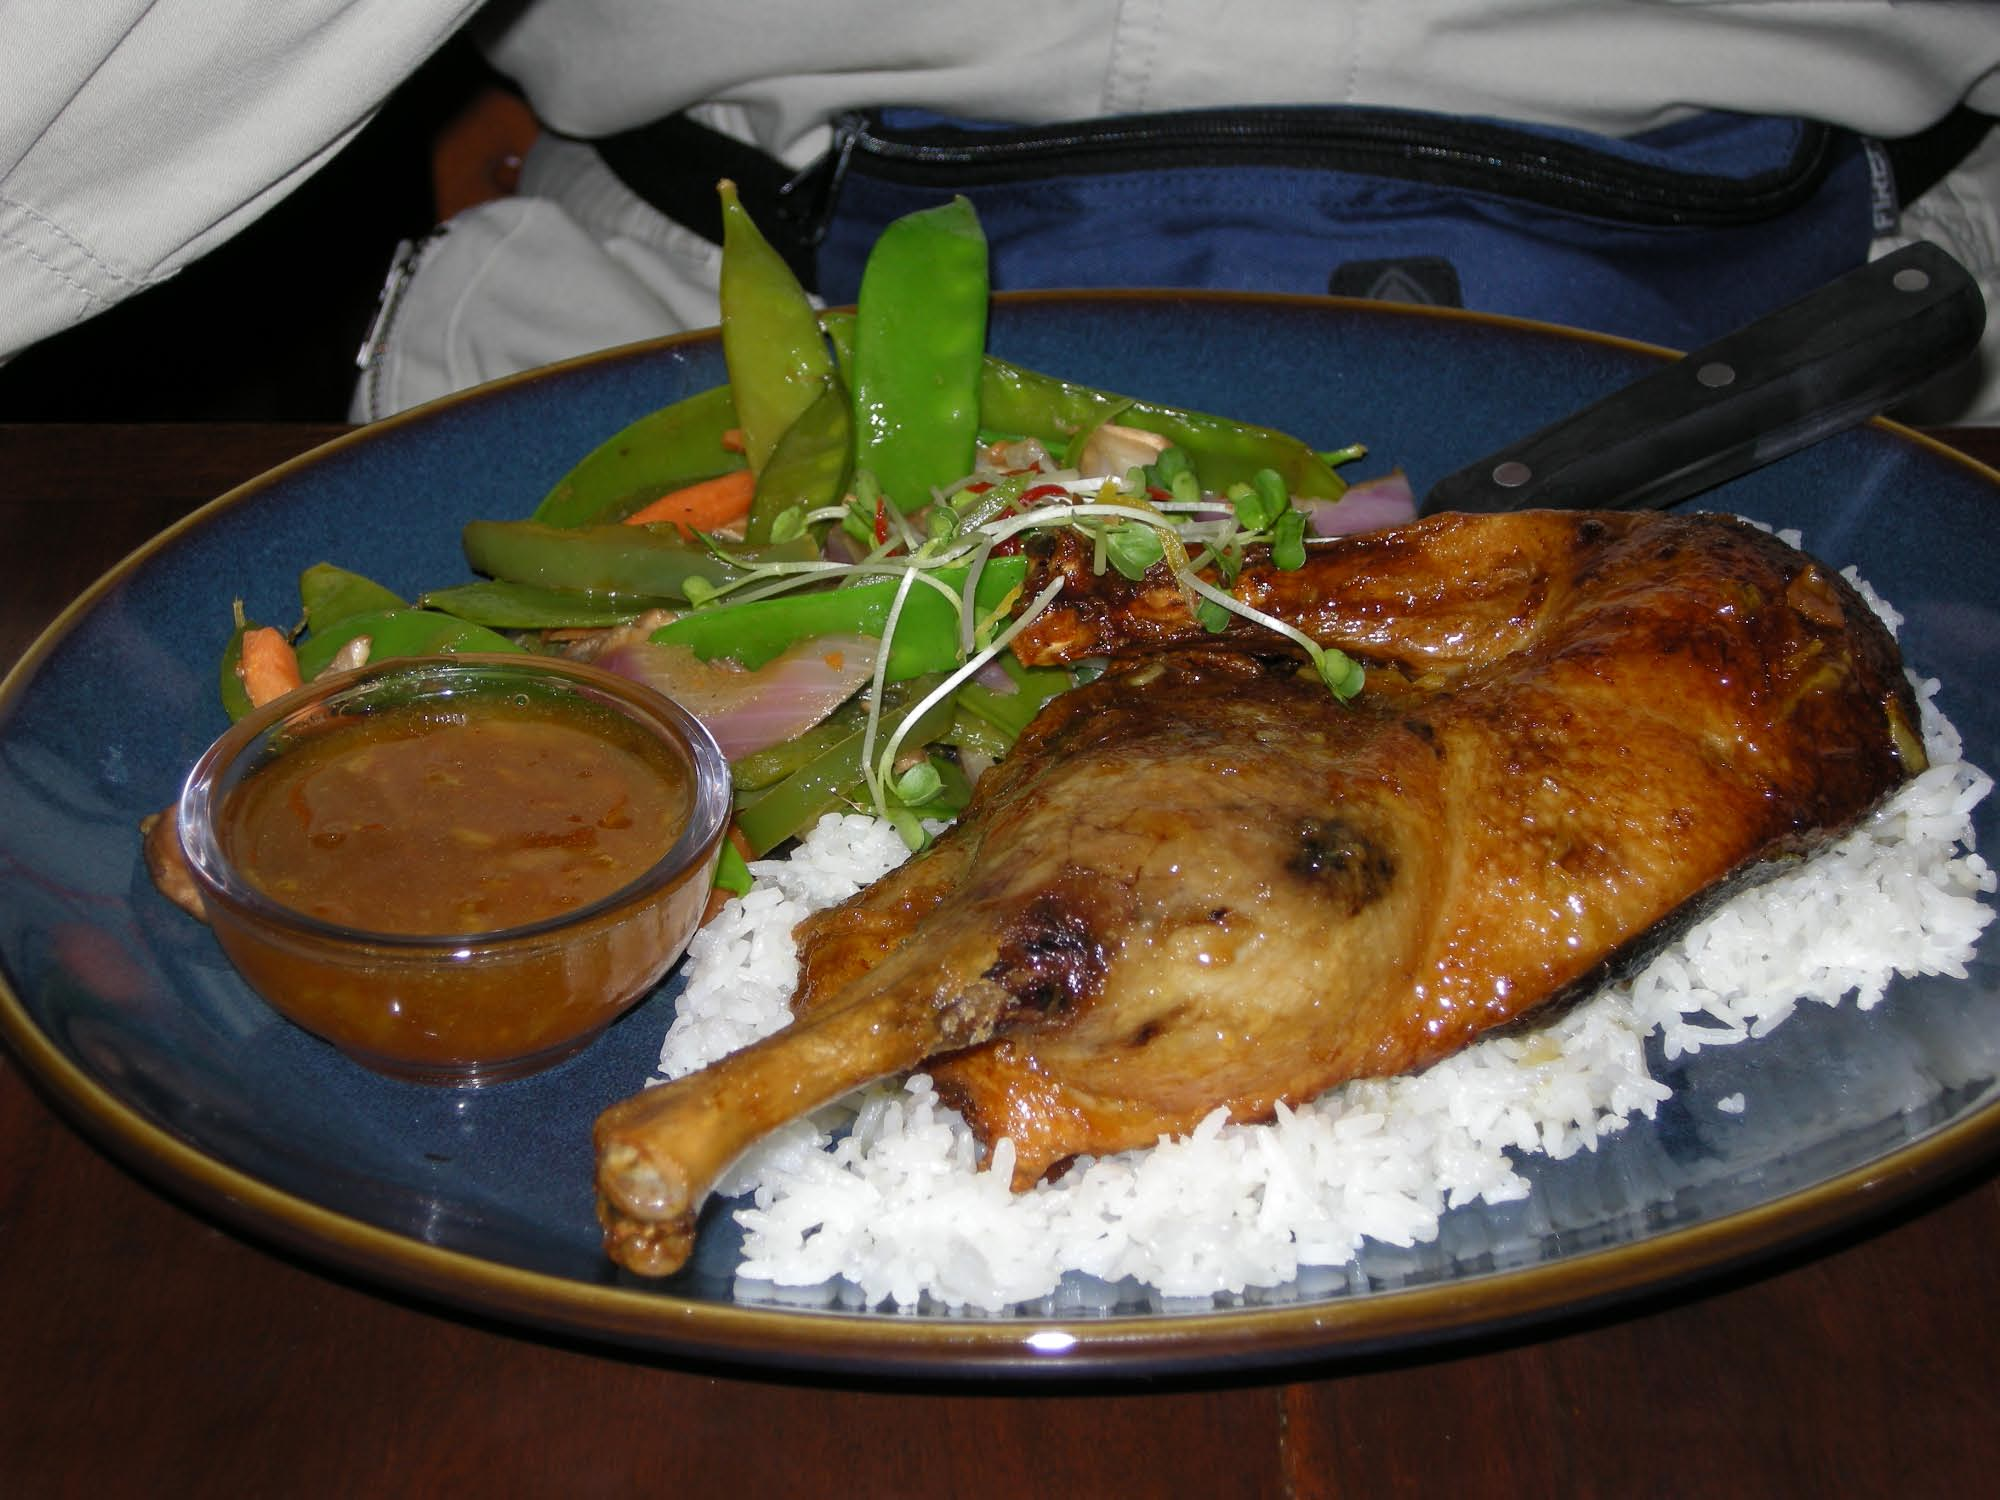 Animal Kingdom - Asia - Yak & Yeti Restaurant - Duck with Anandapur Gla photo